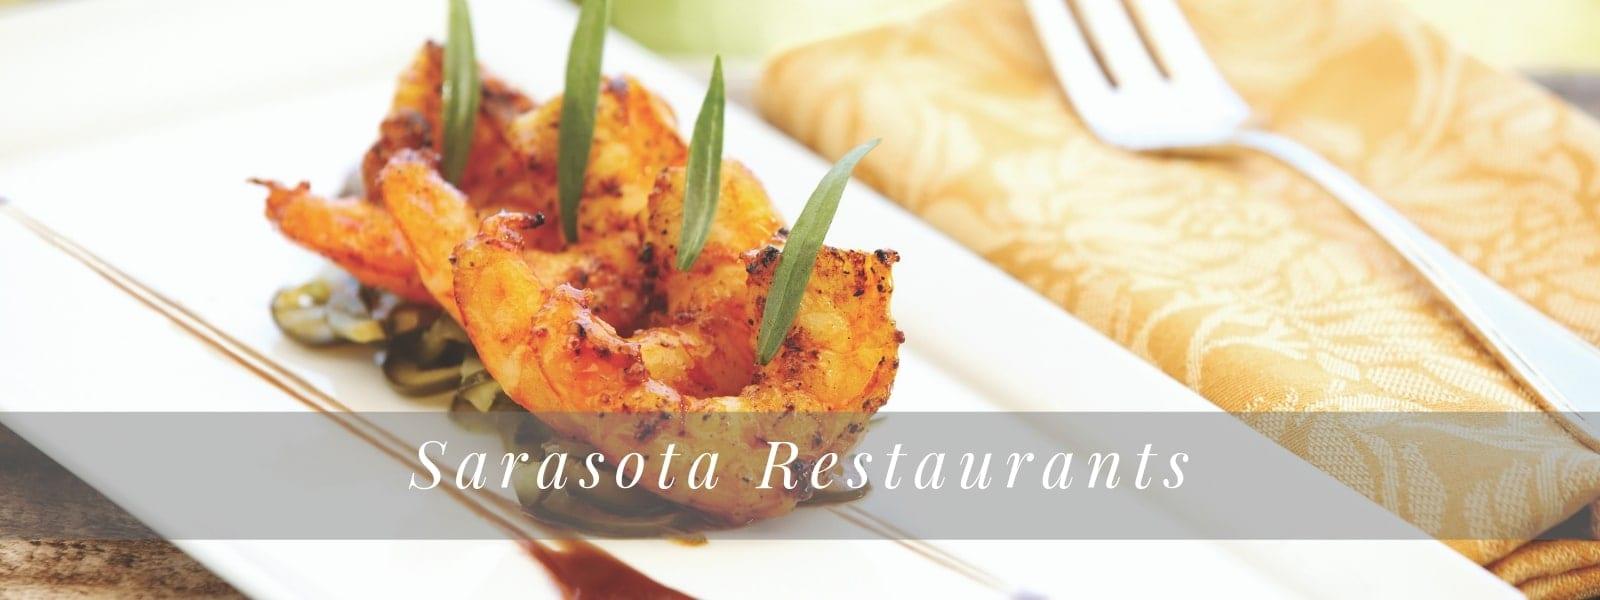 Sarasota Restaurants near BLVD